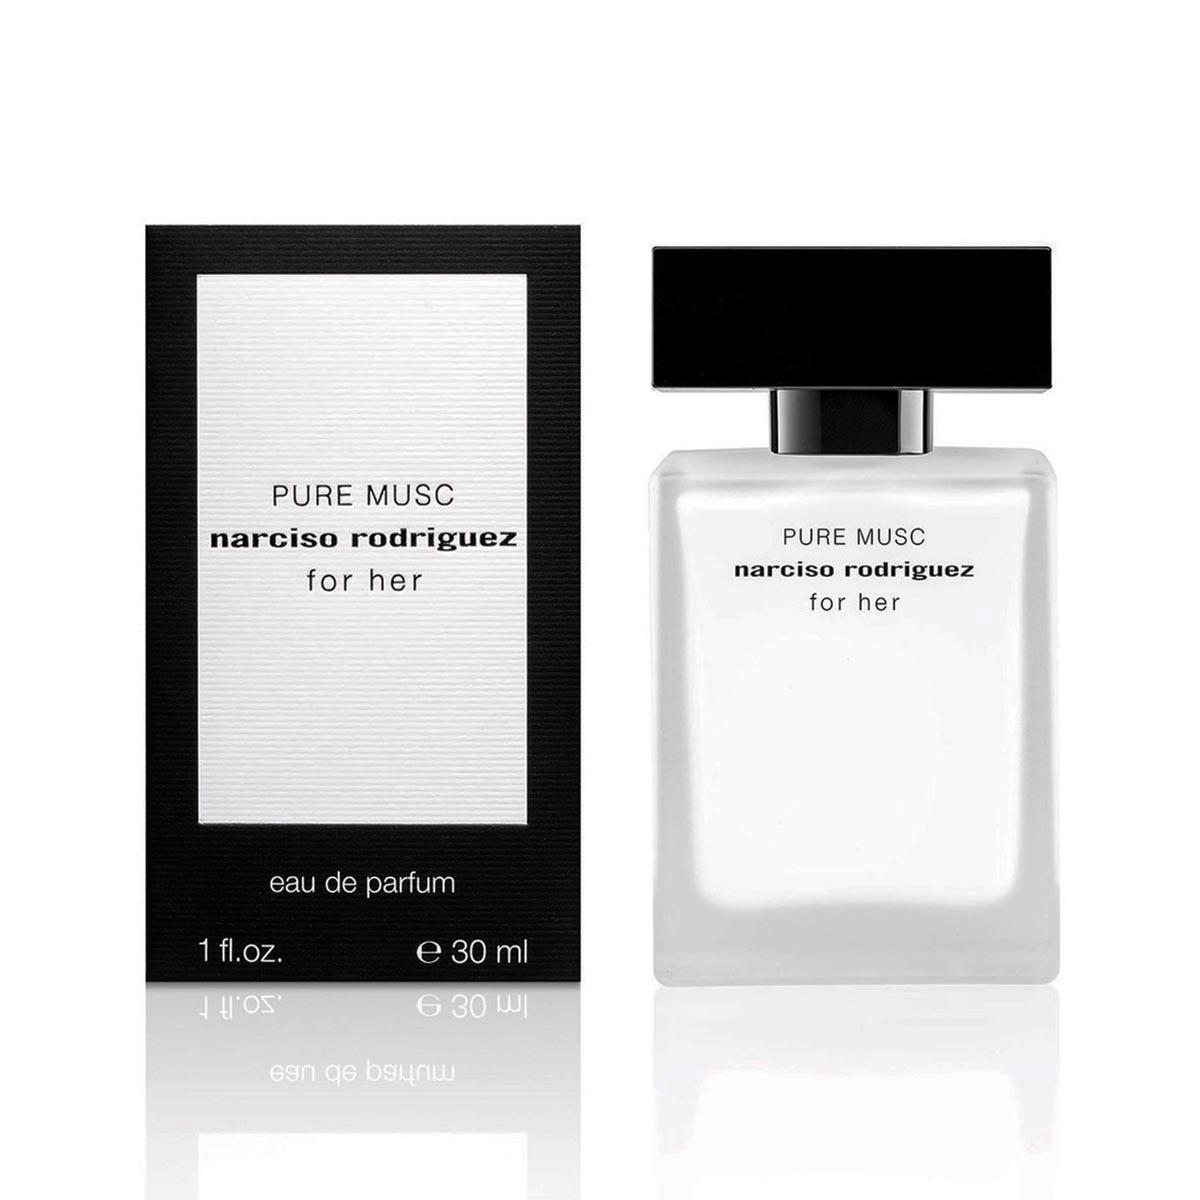 Narciso rodriguez for her pure musc eau de parfum 30ml vaporizador